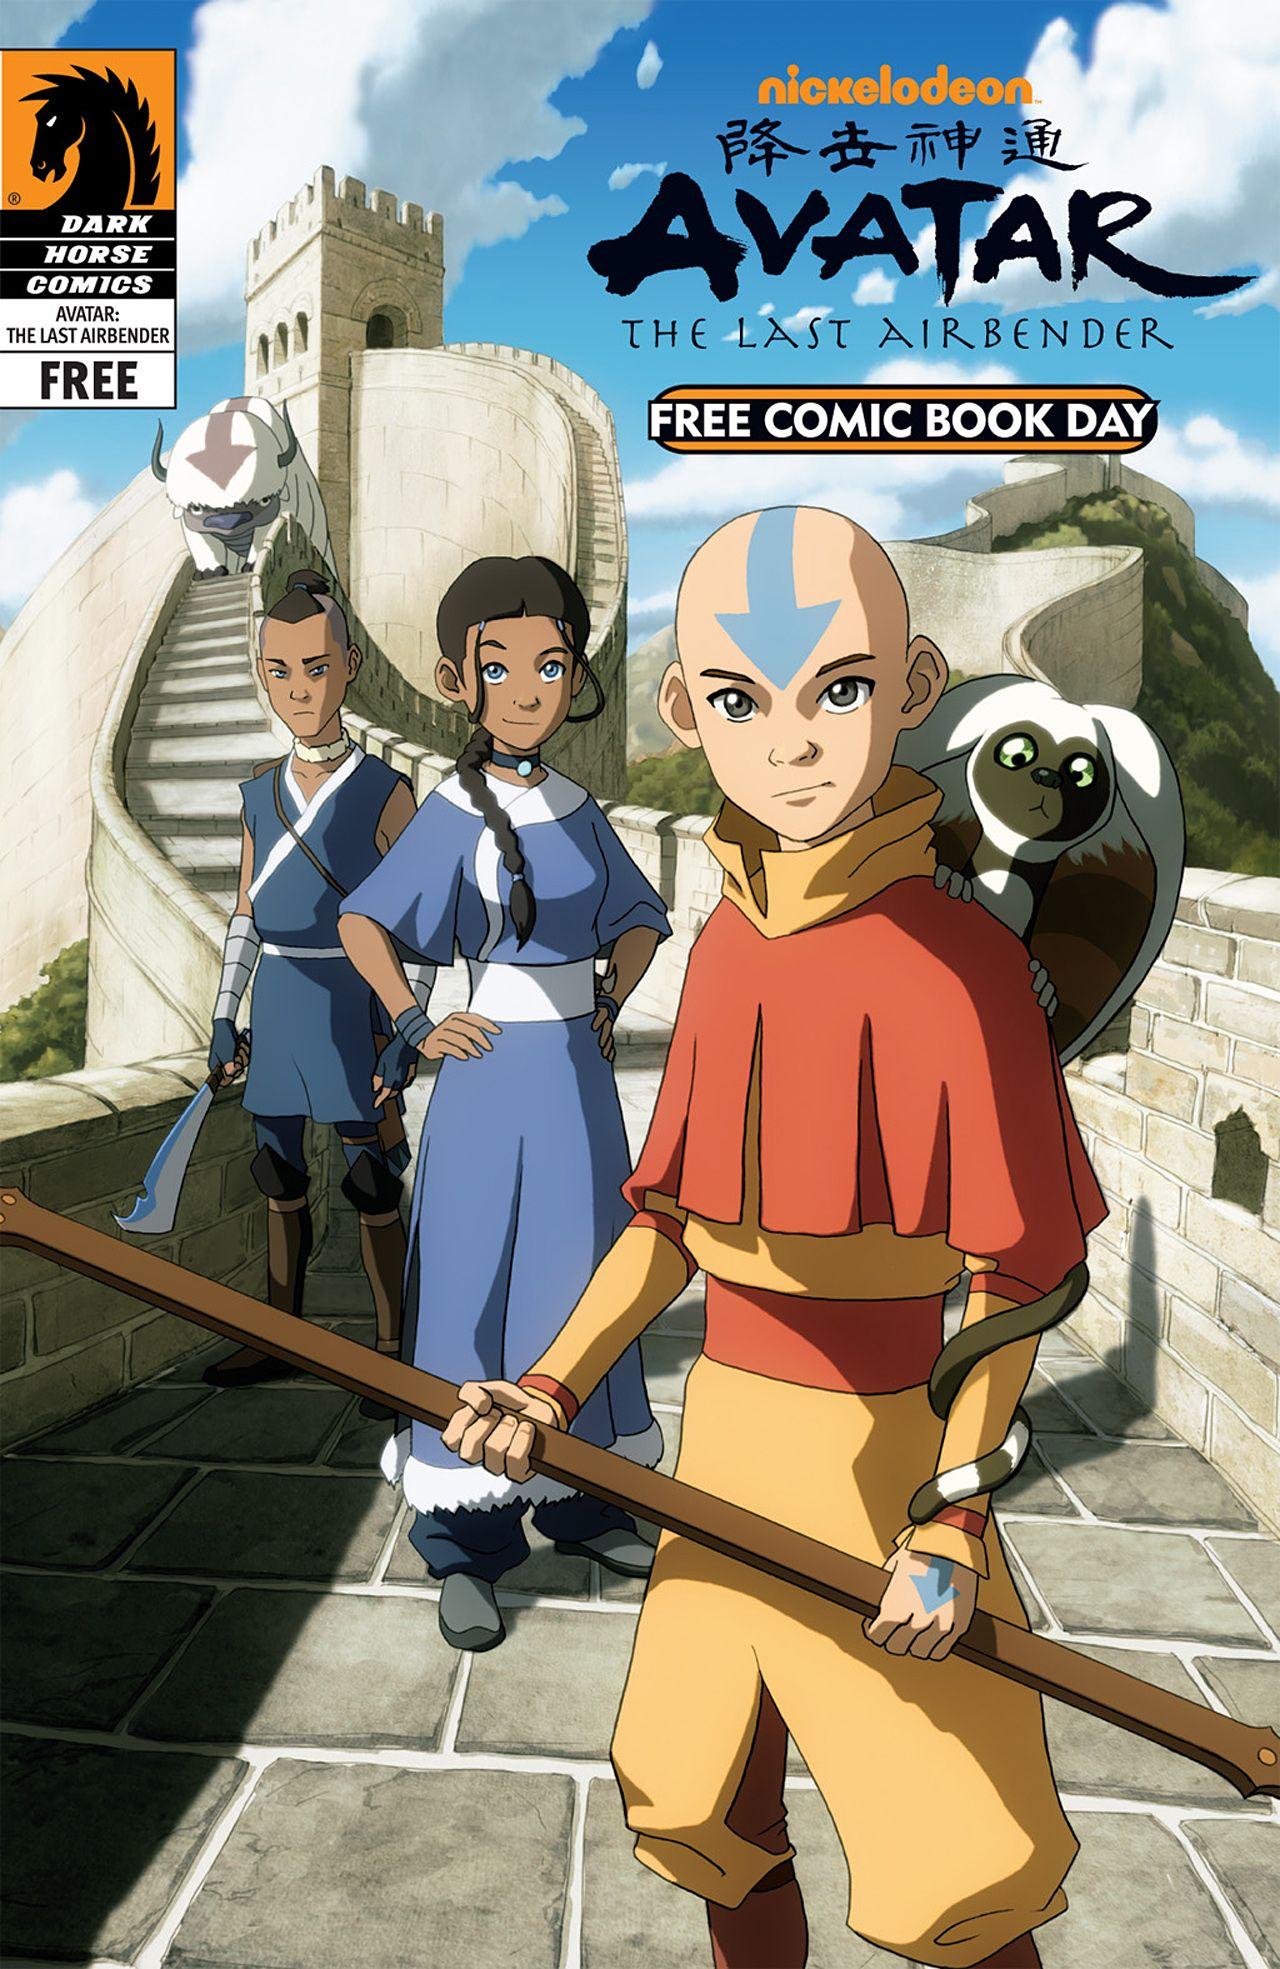 Nickelodeon Avatar: The Last Airbender 001 | Avatar The Last